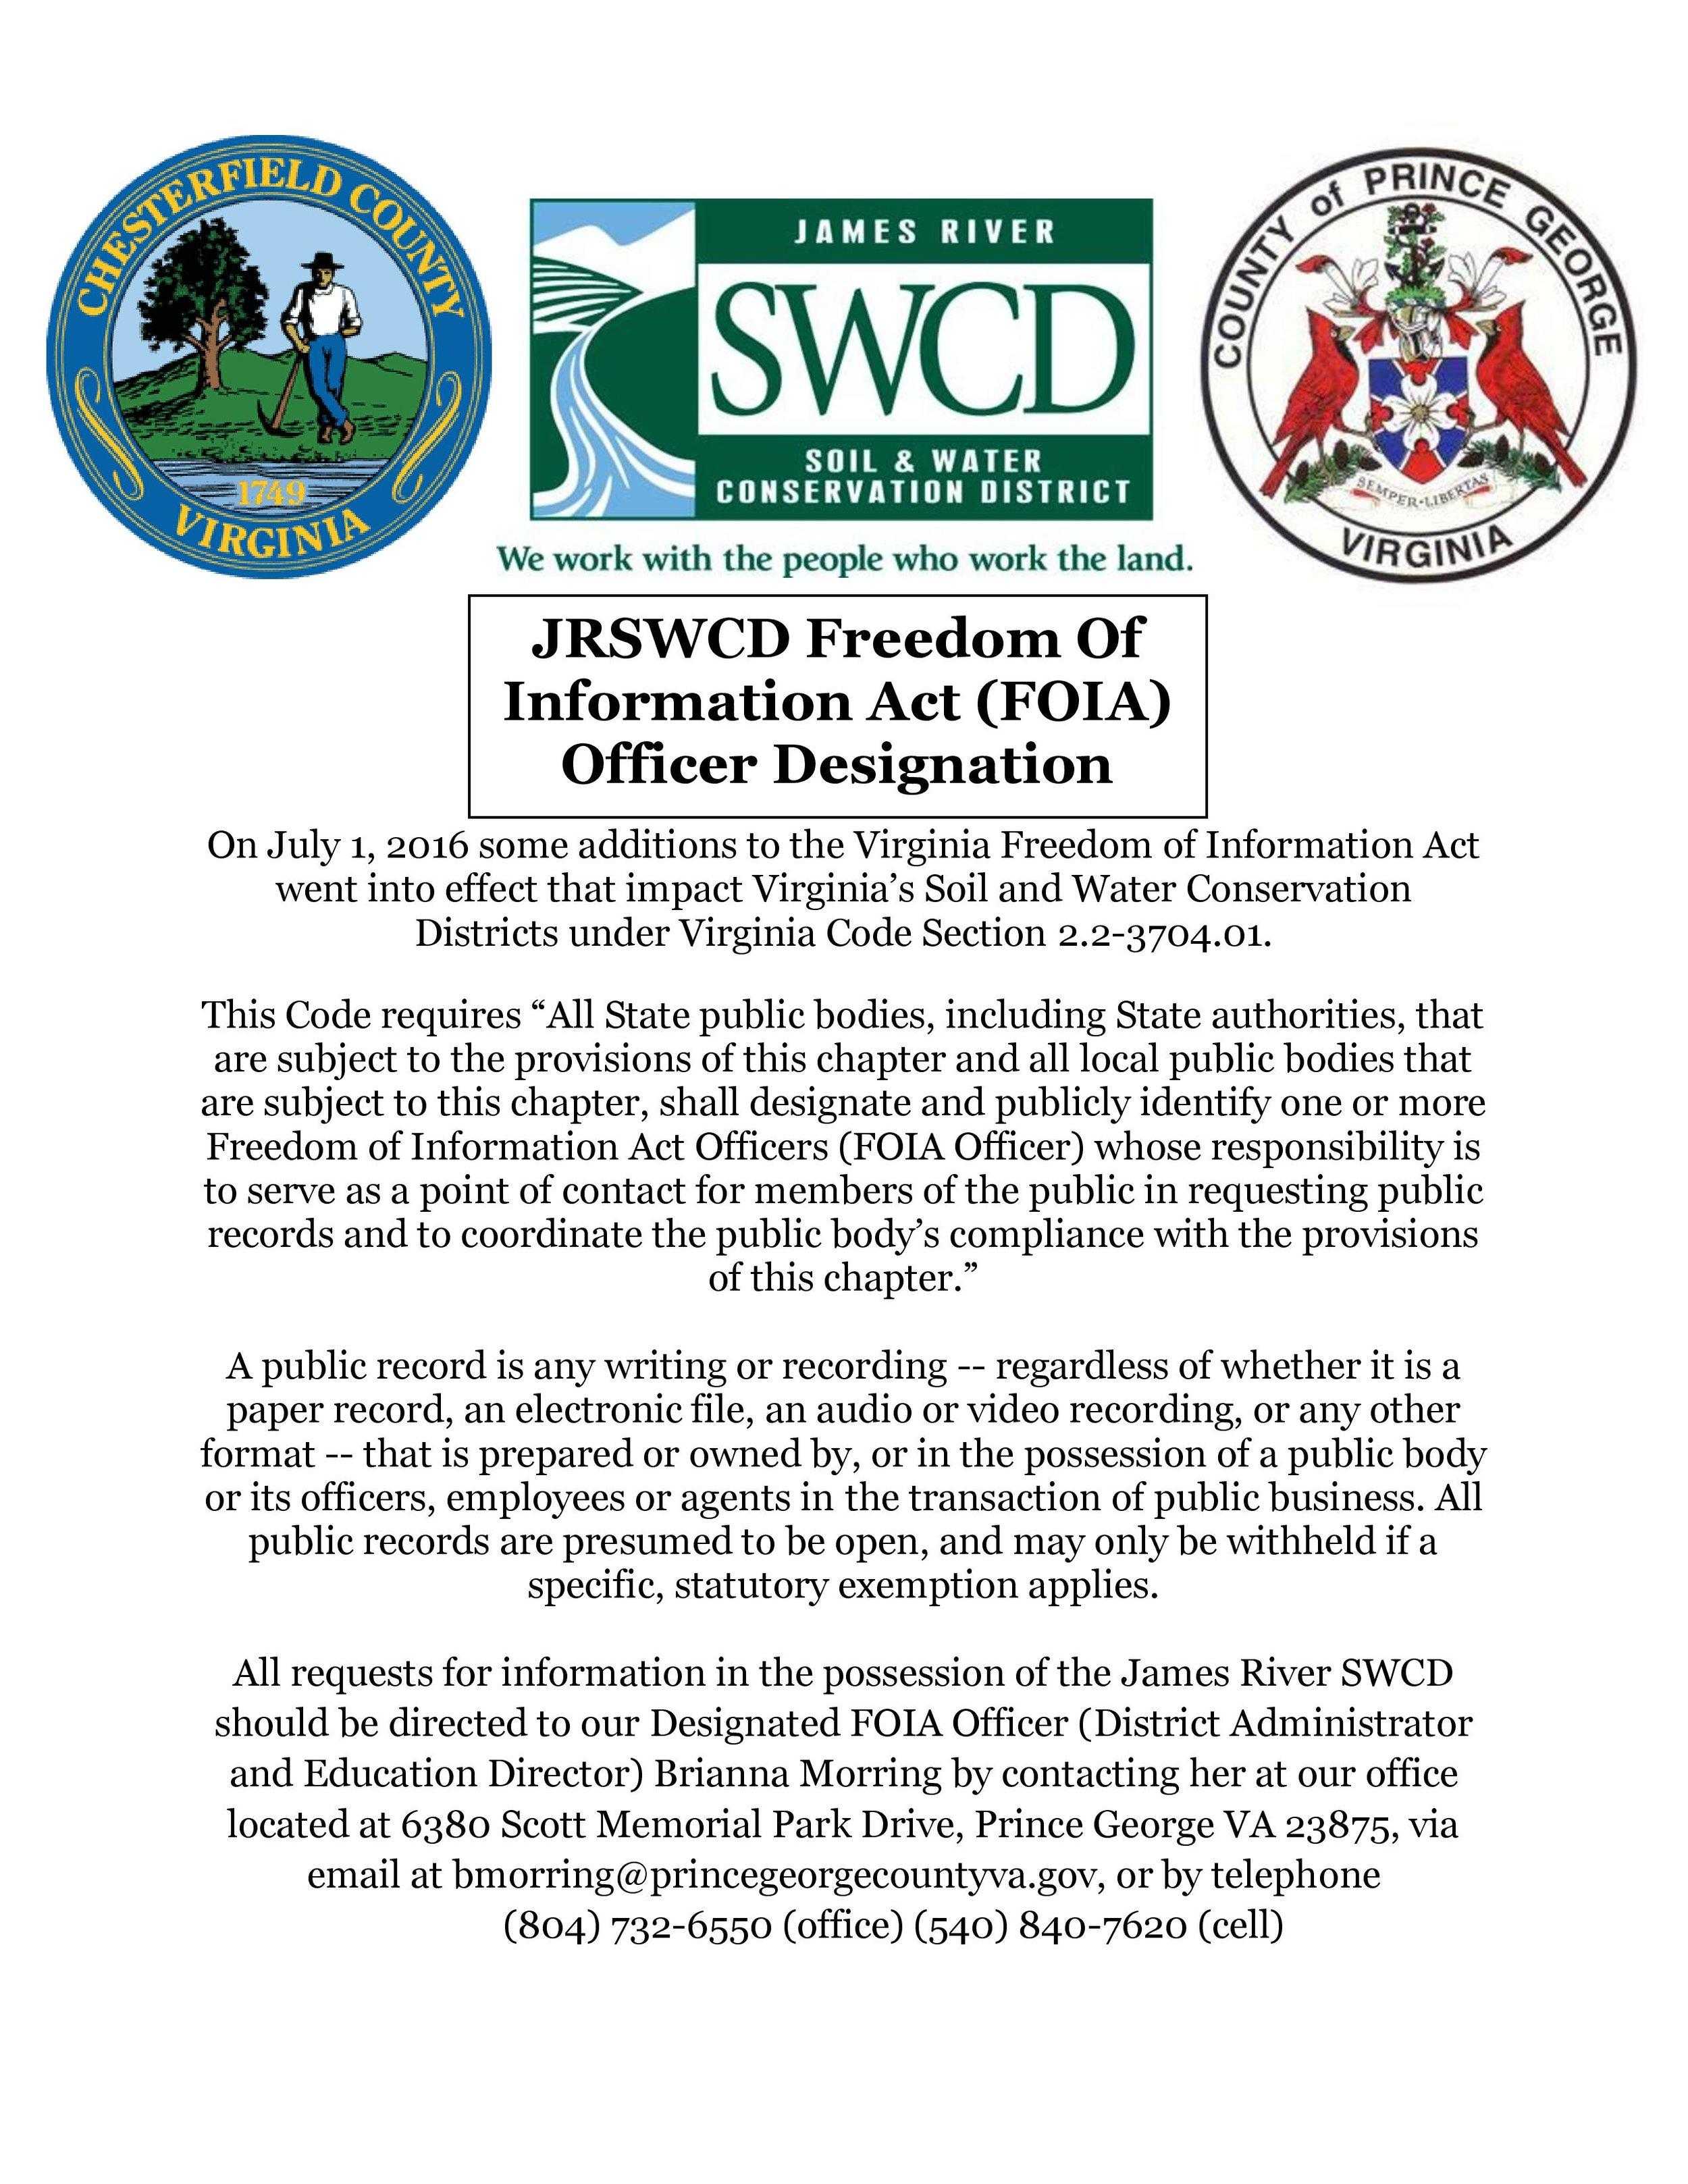 FOIA+Officer+Designation-page-001.jpg